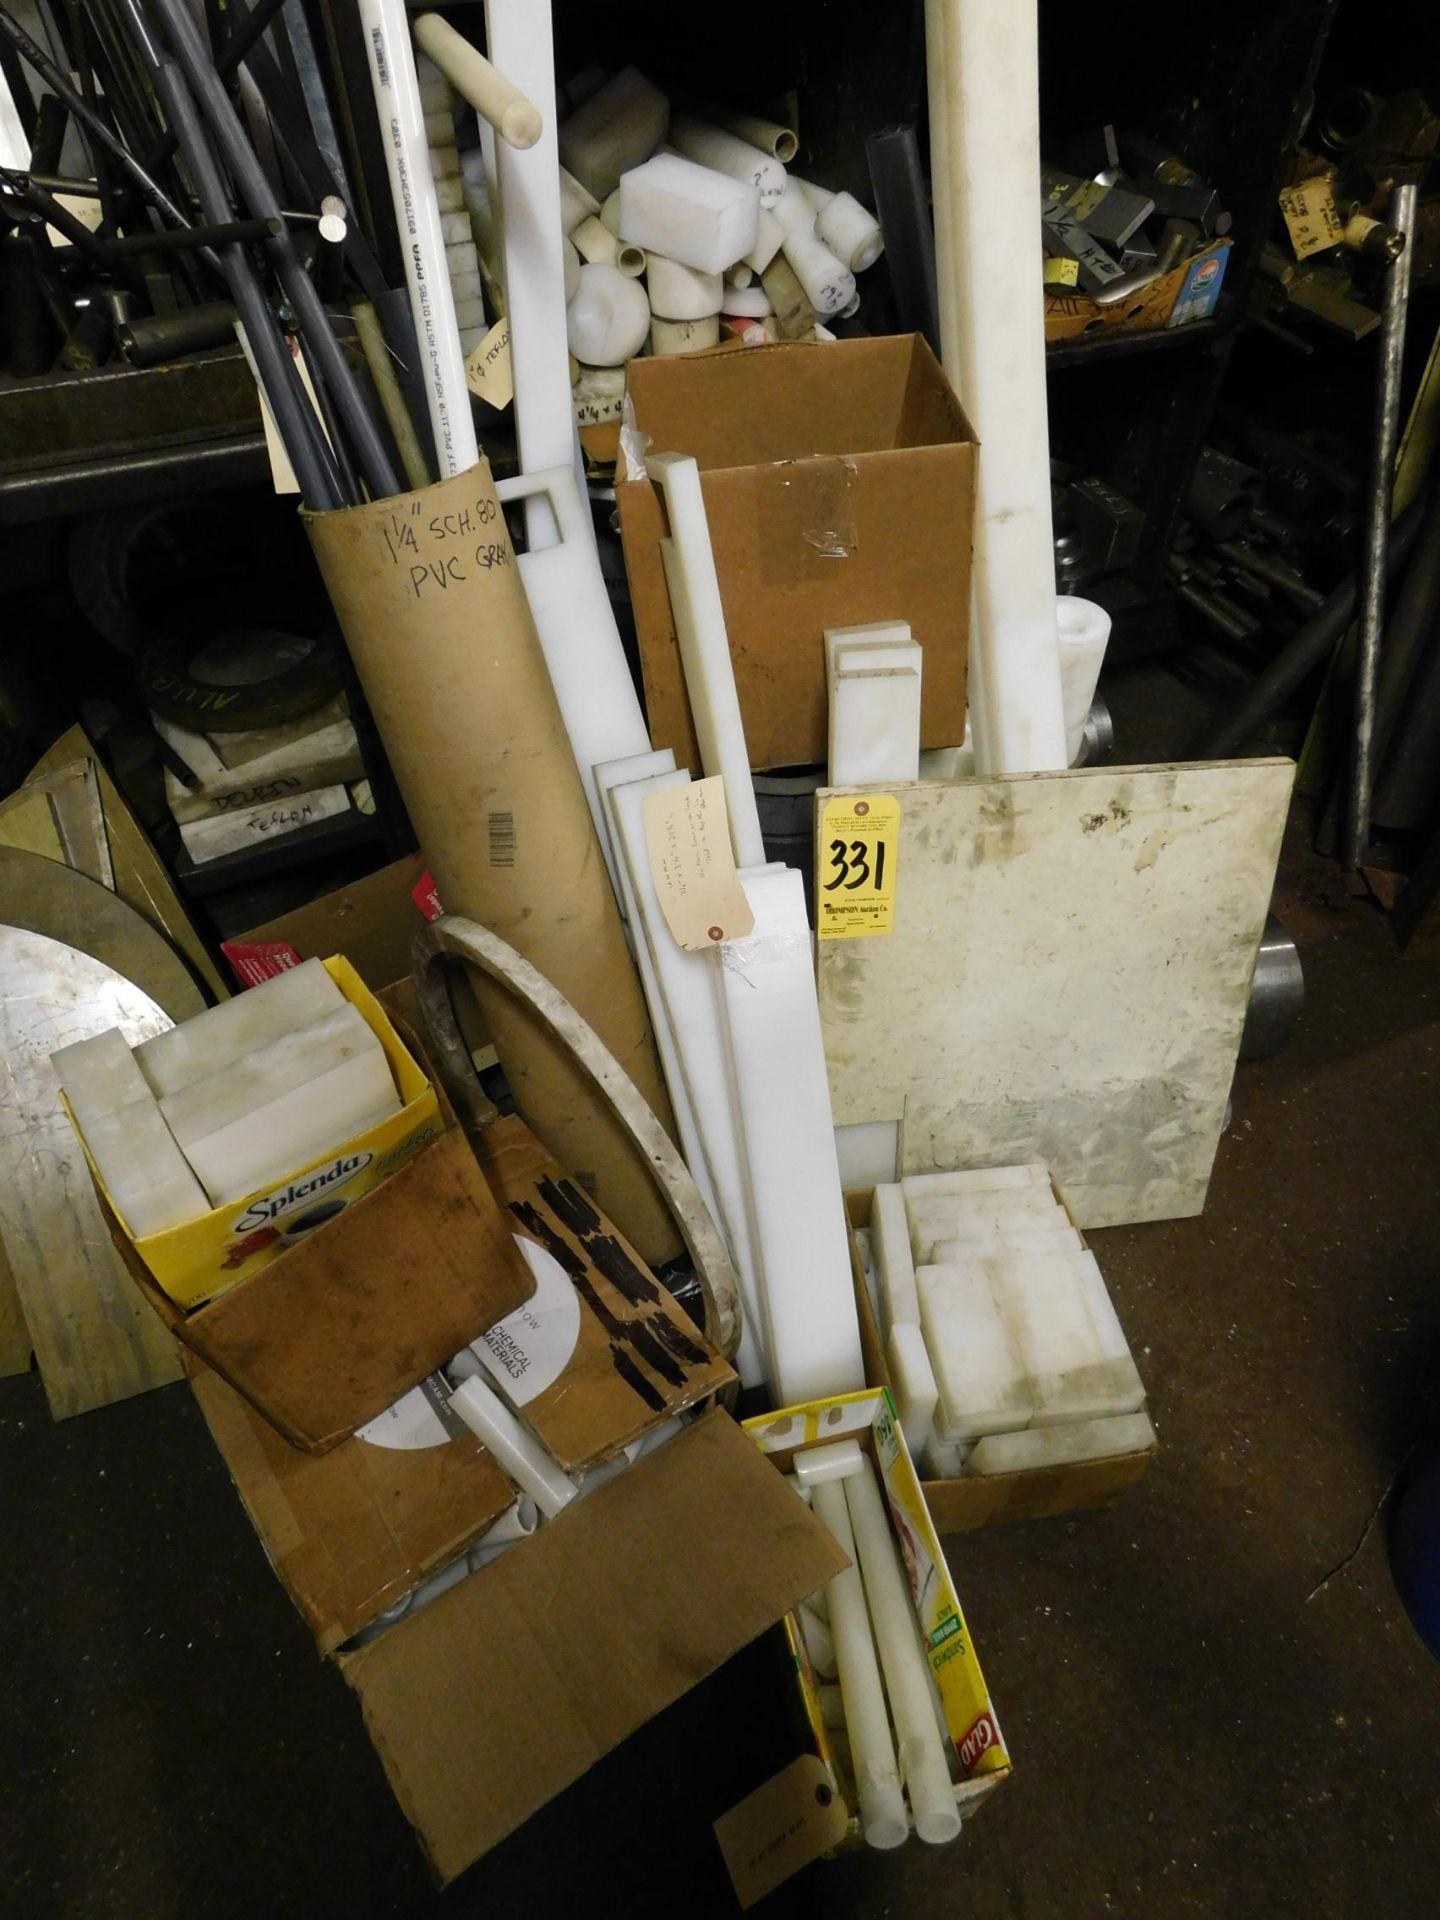 Lot 331 - Miscellaneous Plastic Material